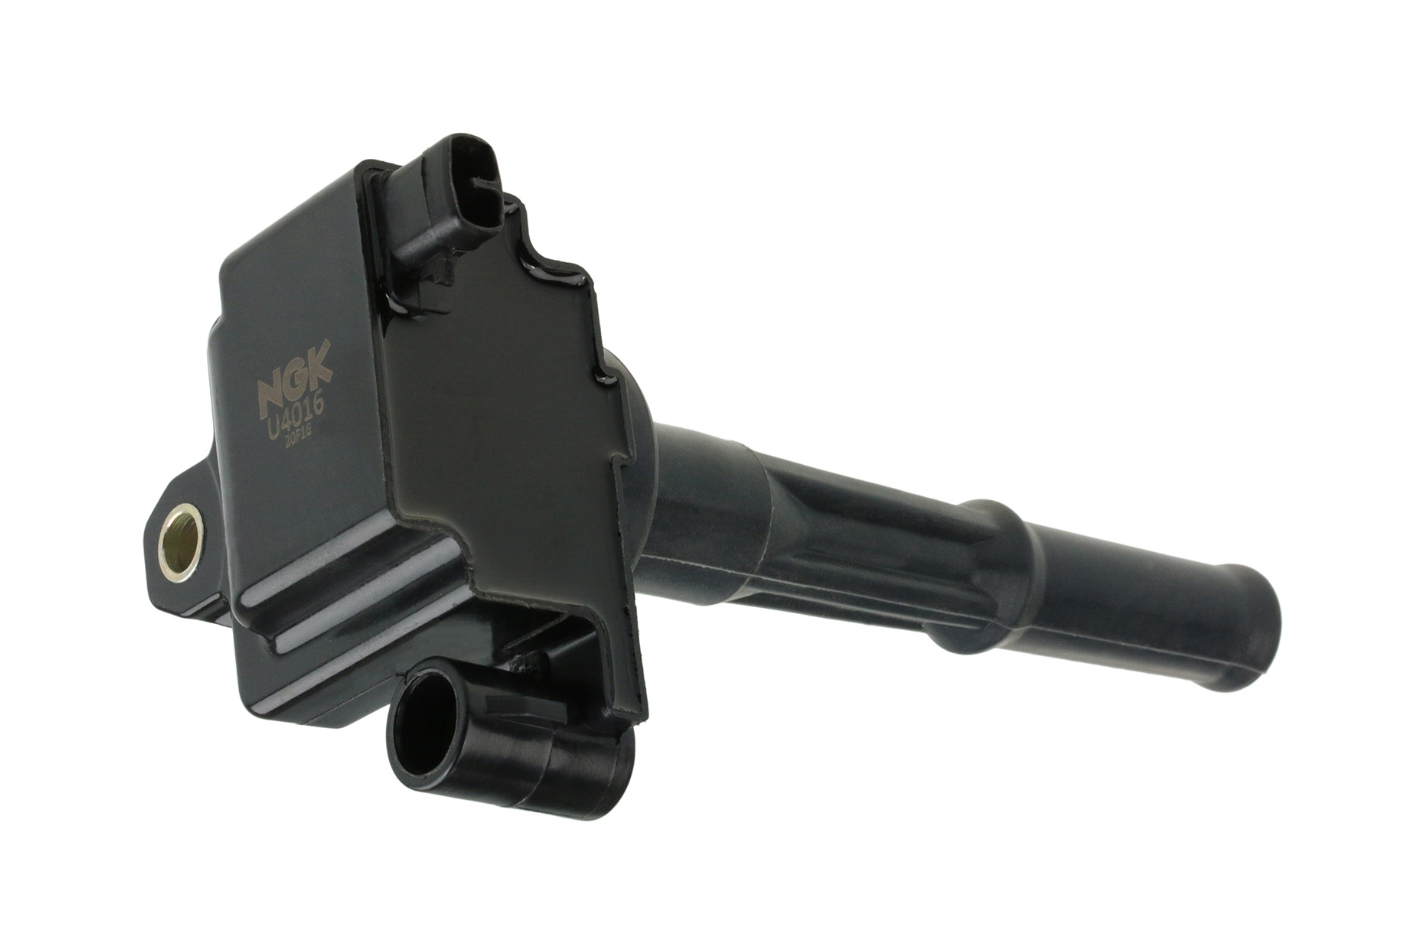 NGK U4016 Ignition Coil Pack, Coil-On-Plug Waste Spark, OE Specs, Black, Each